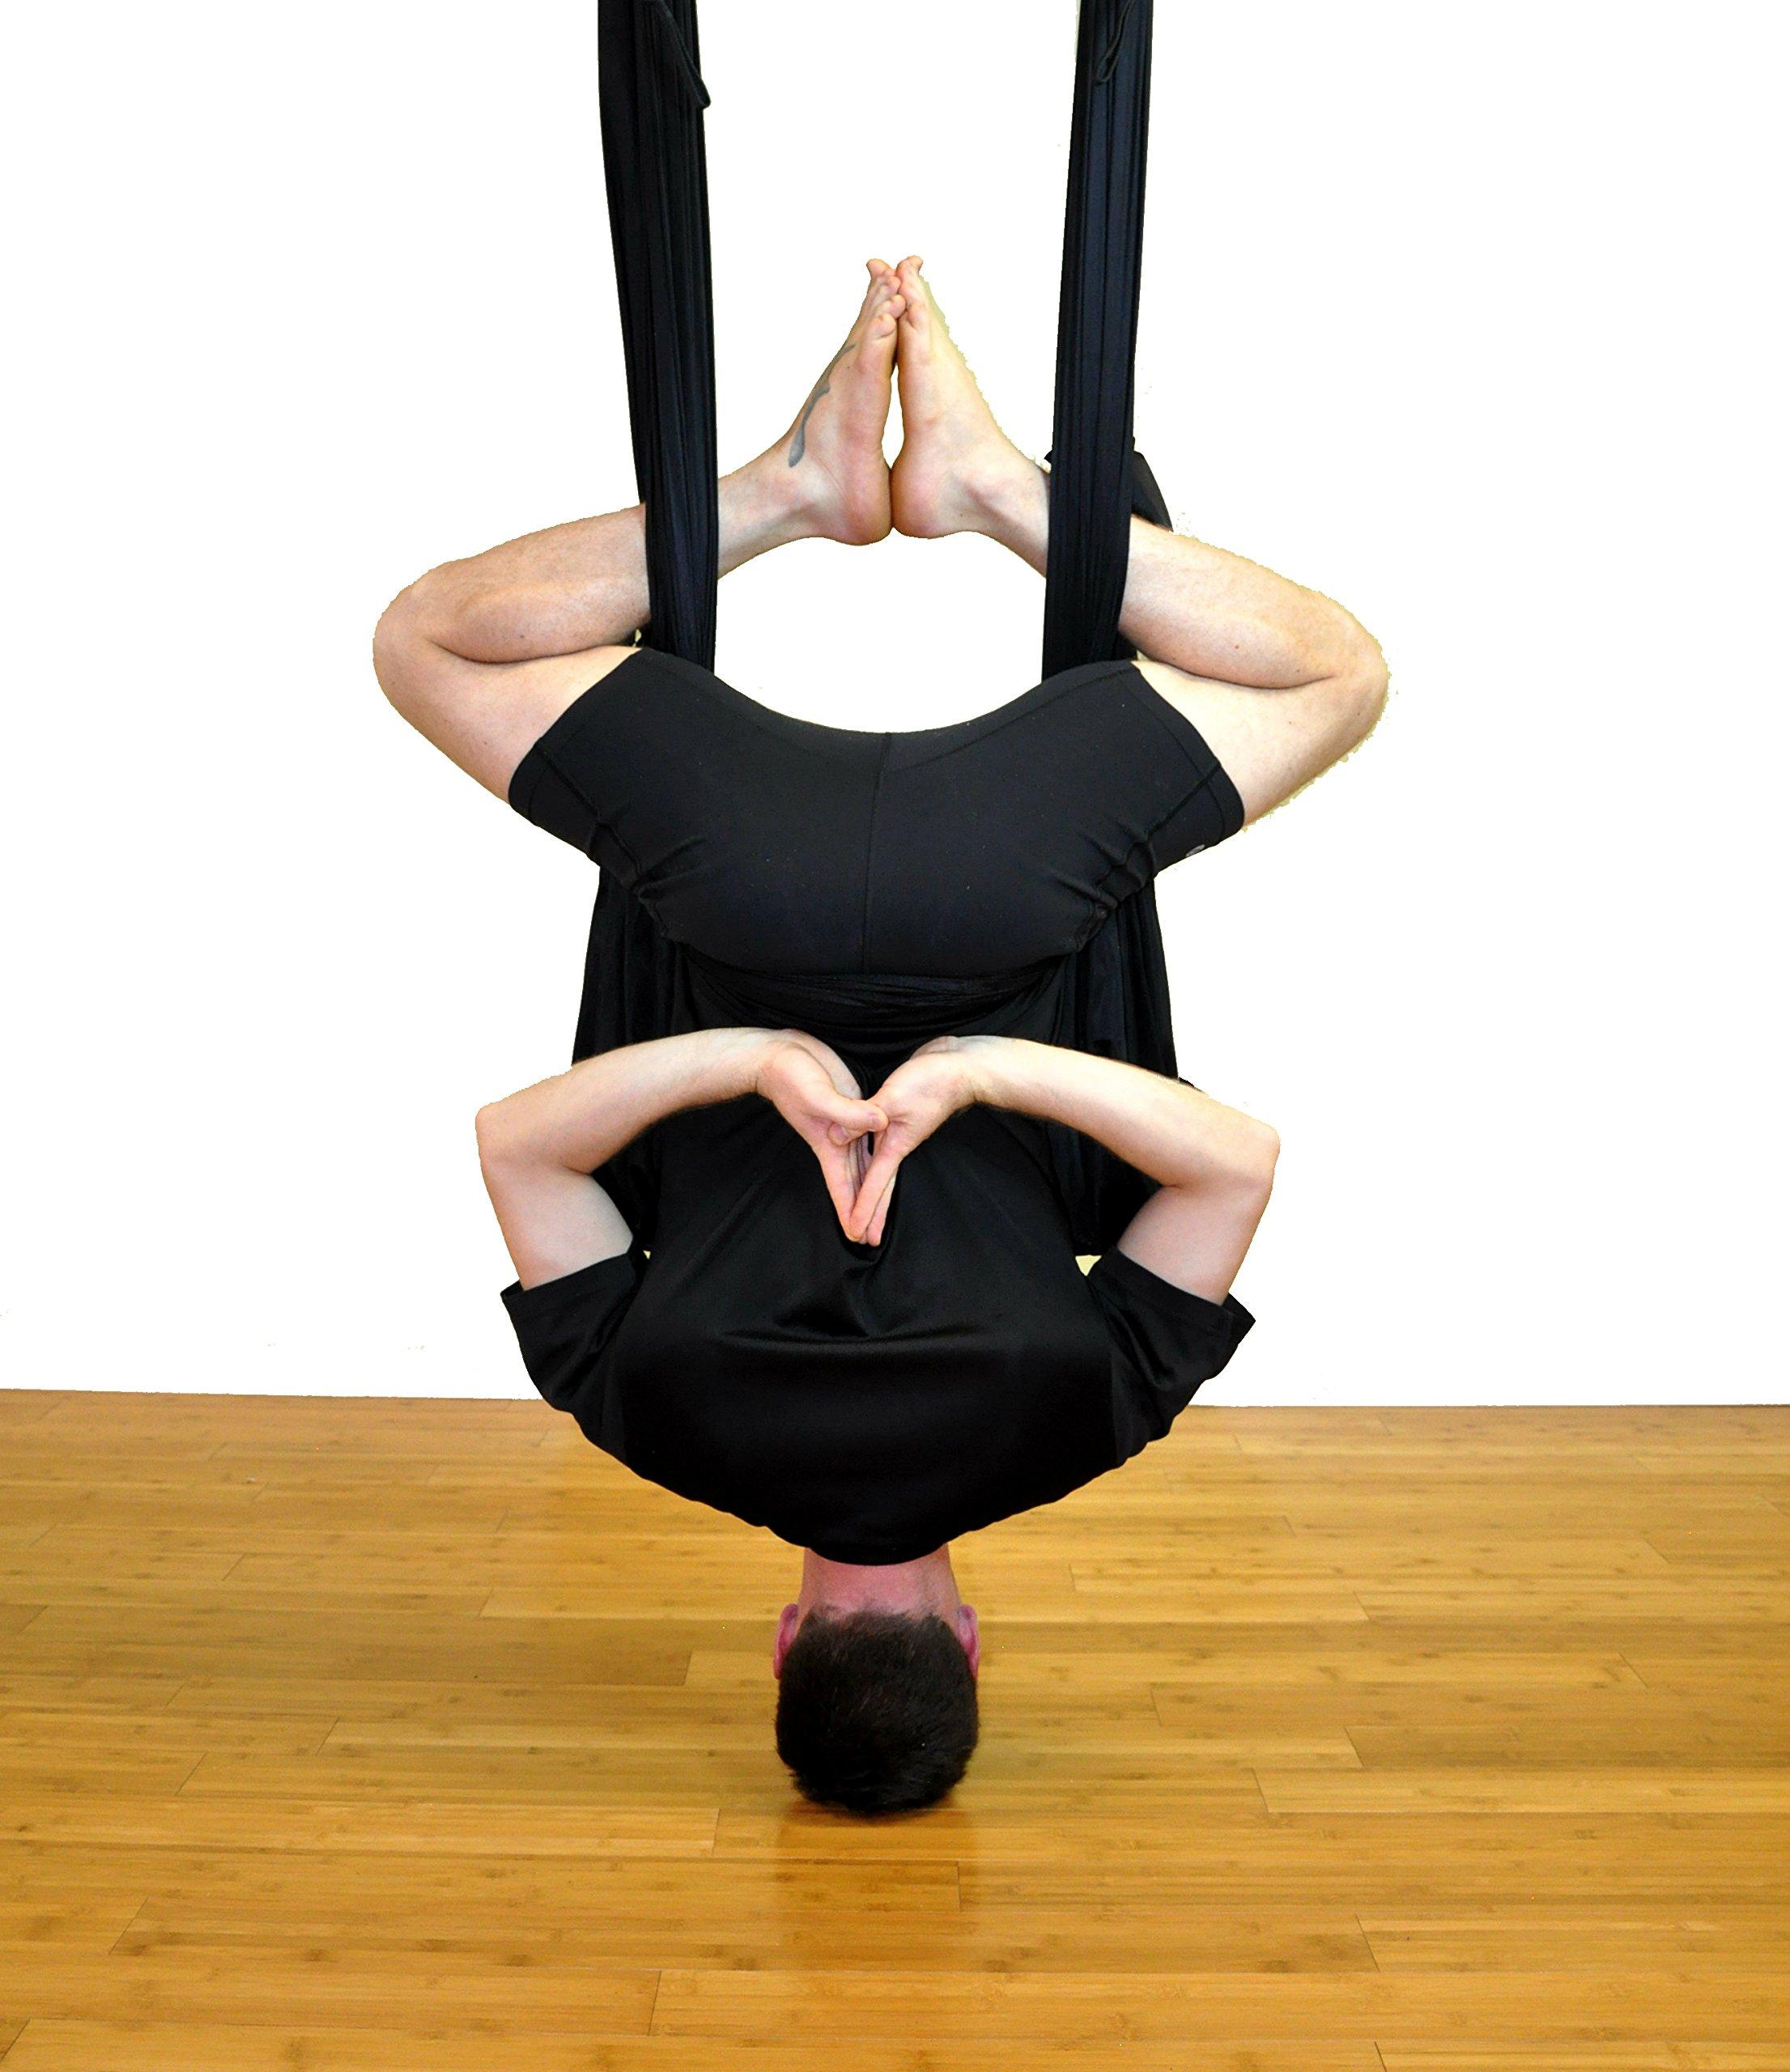 Deluxe Aerial Yoga Hammock (Yoga Swing or Sling for Aerial Yoga) (Black)